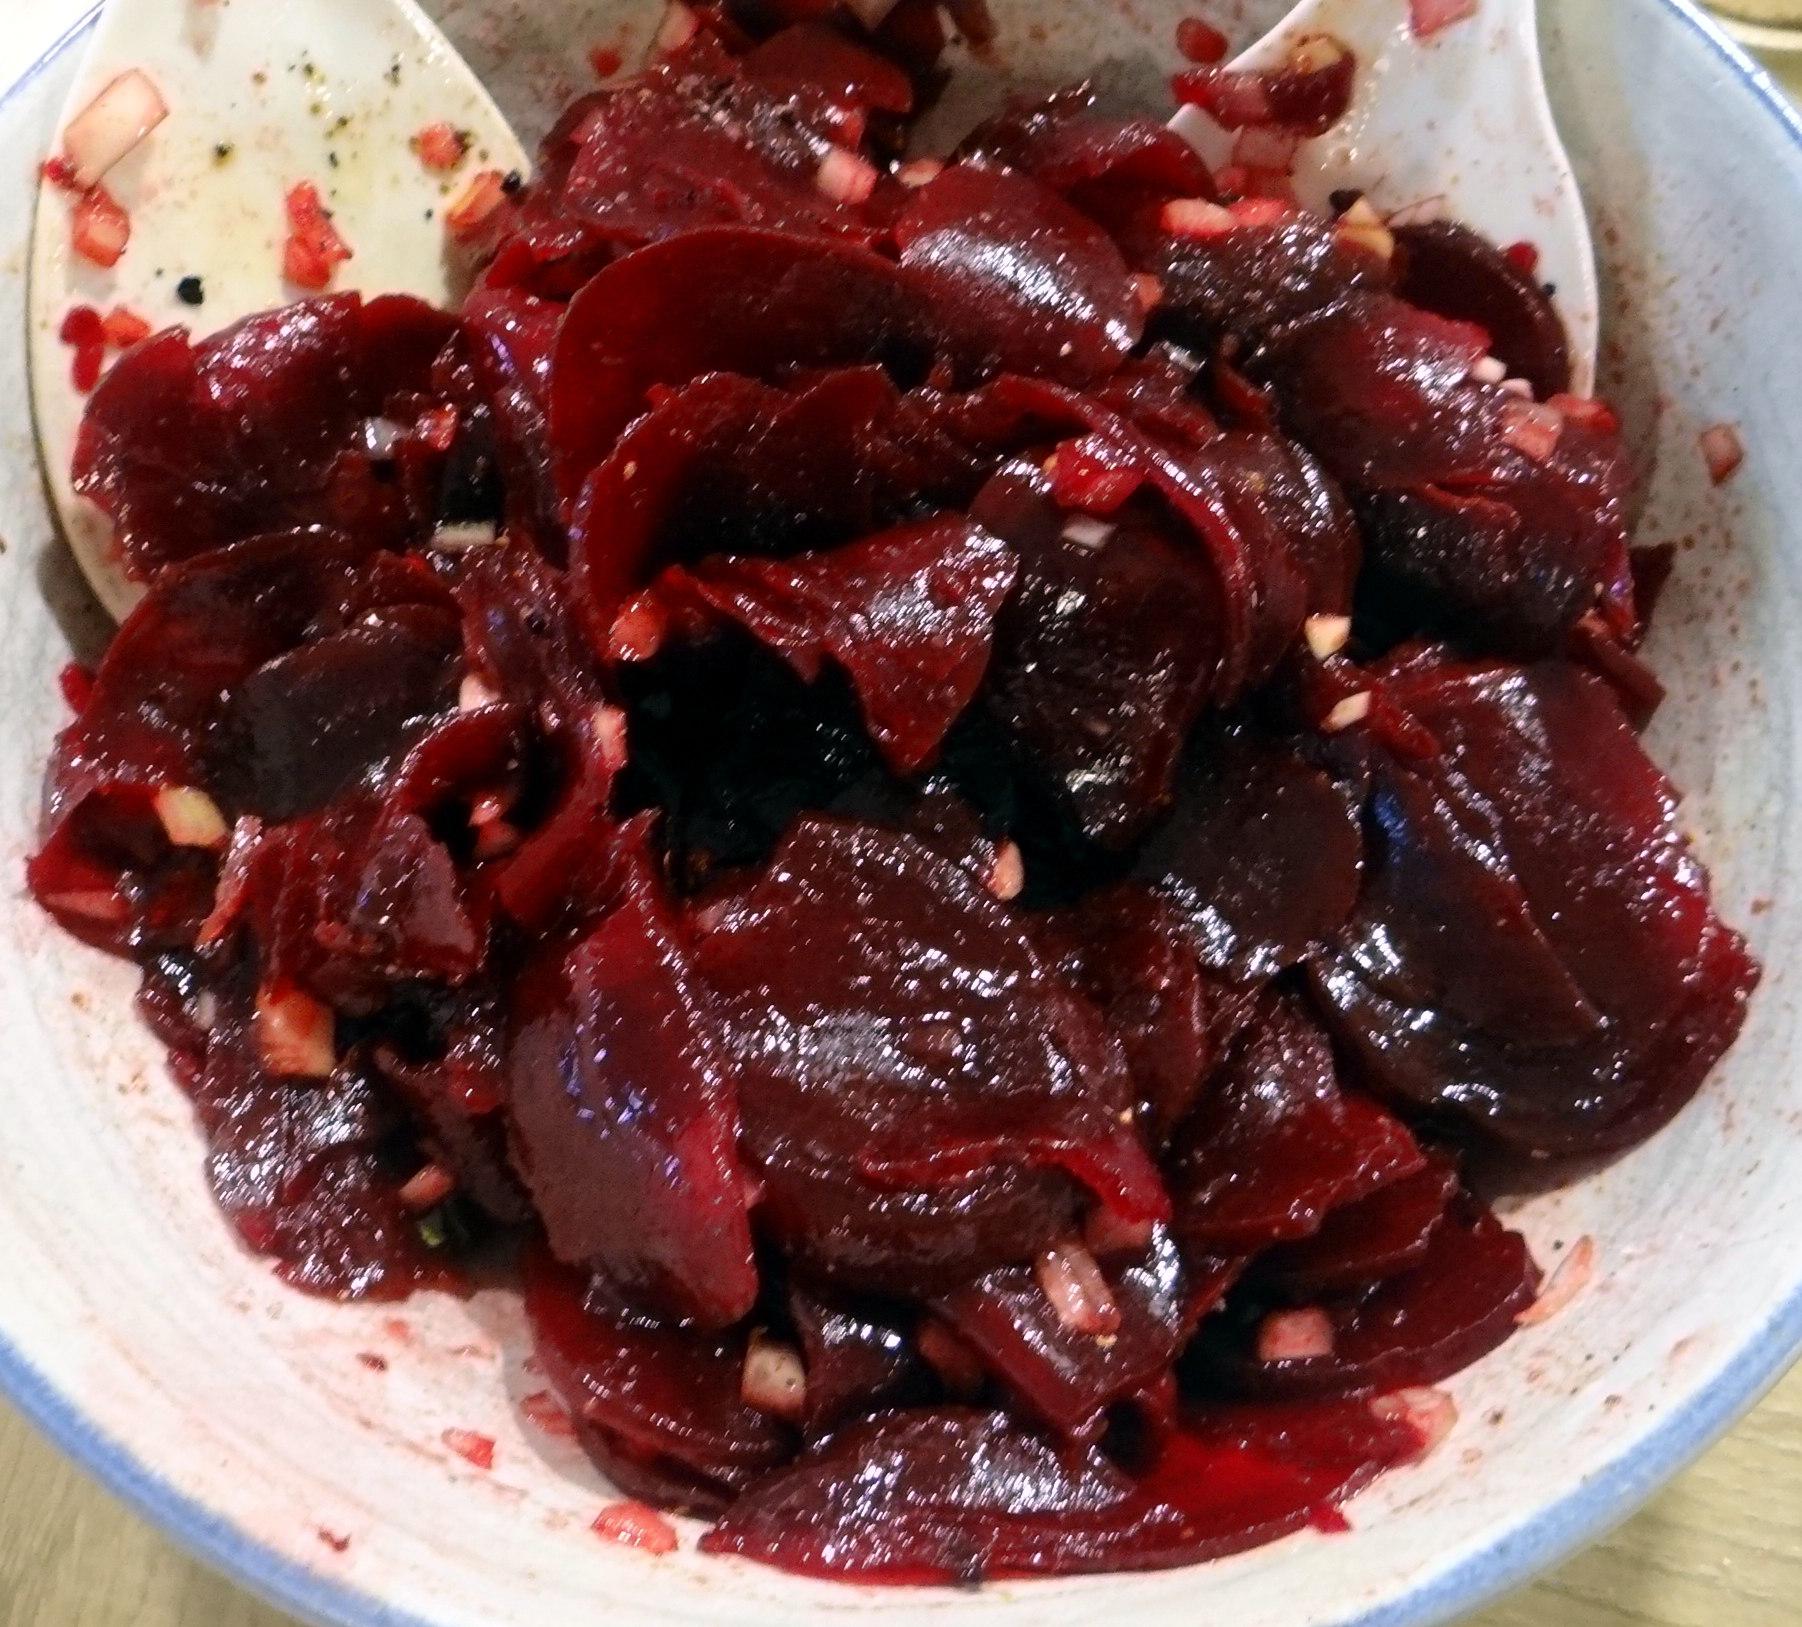 Rohgebratene Kartoffeln,Möhrensalat,Rote Bete Salat (10)